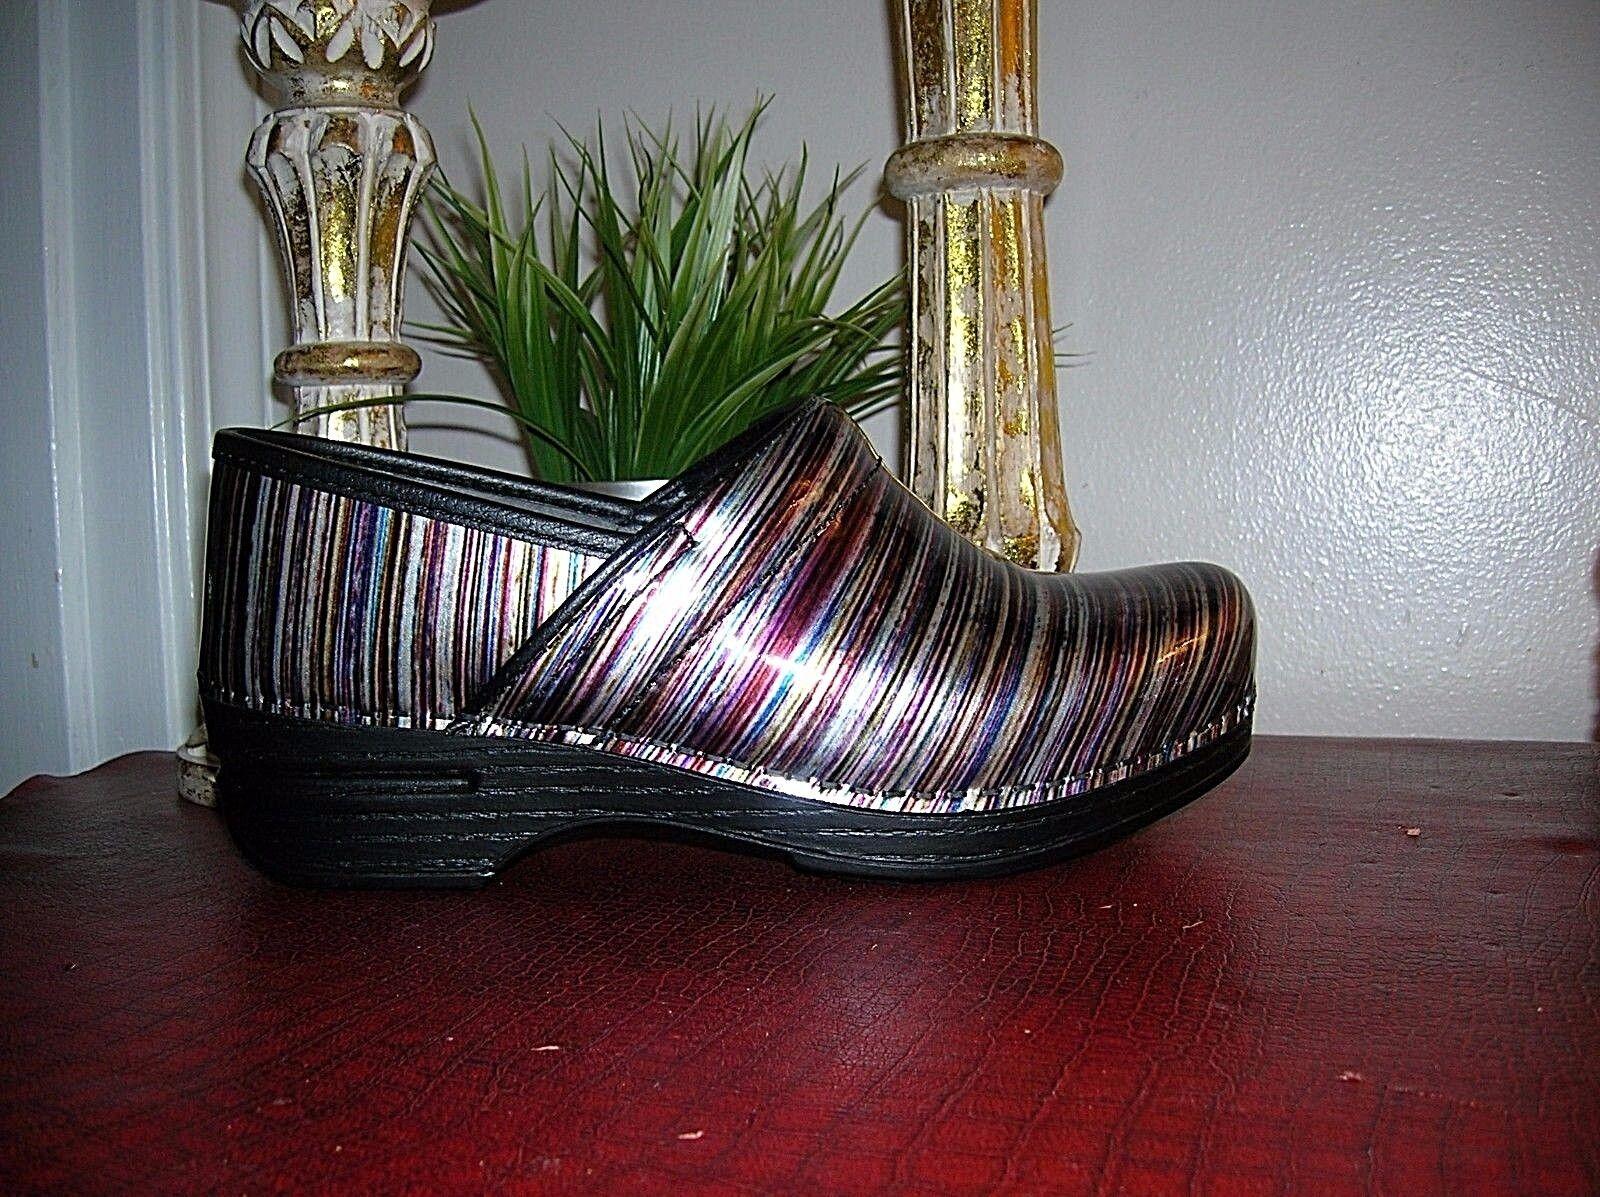 New Women's Dansko Grey Patent Professional Clogs Clogs Clogs shoes Size eu 42 us 11.5-12 3981f1